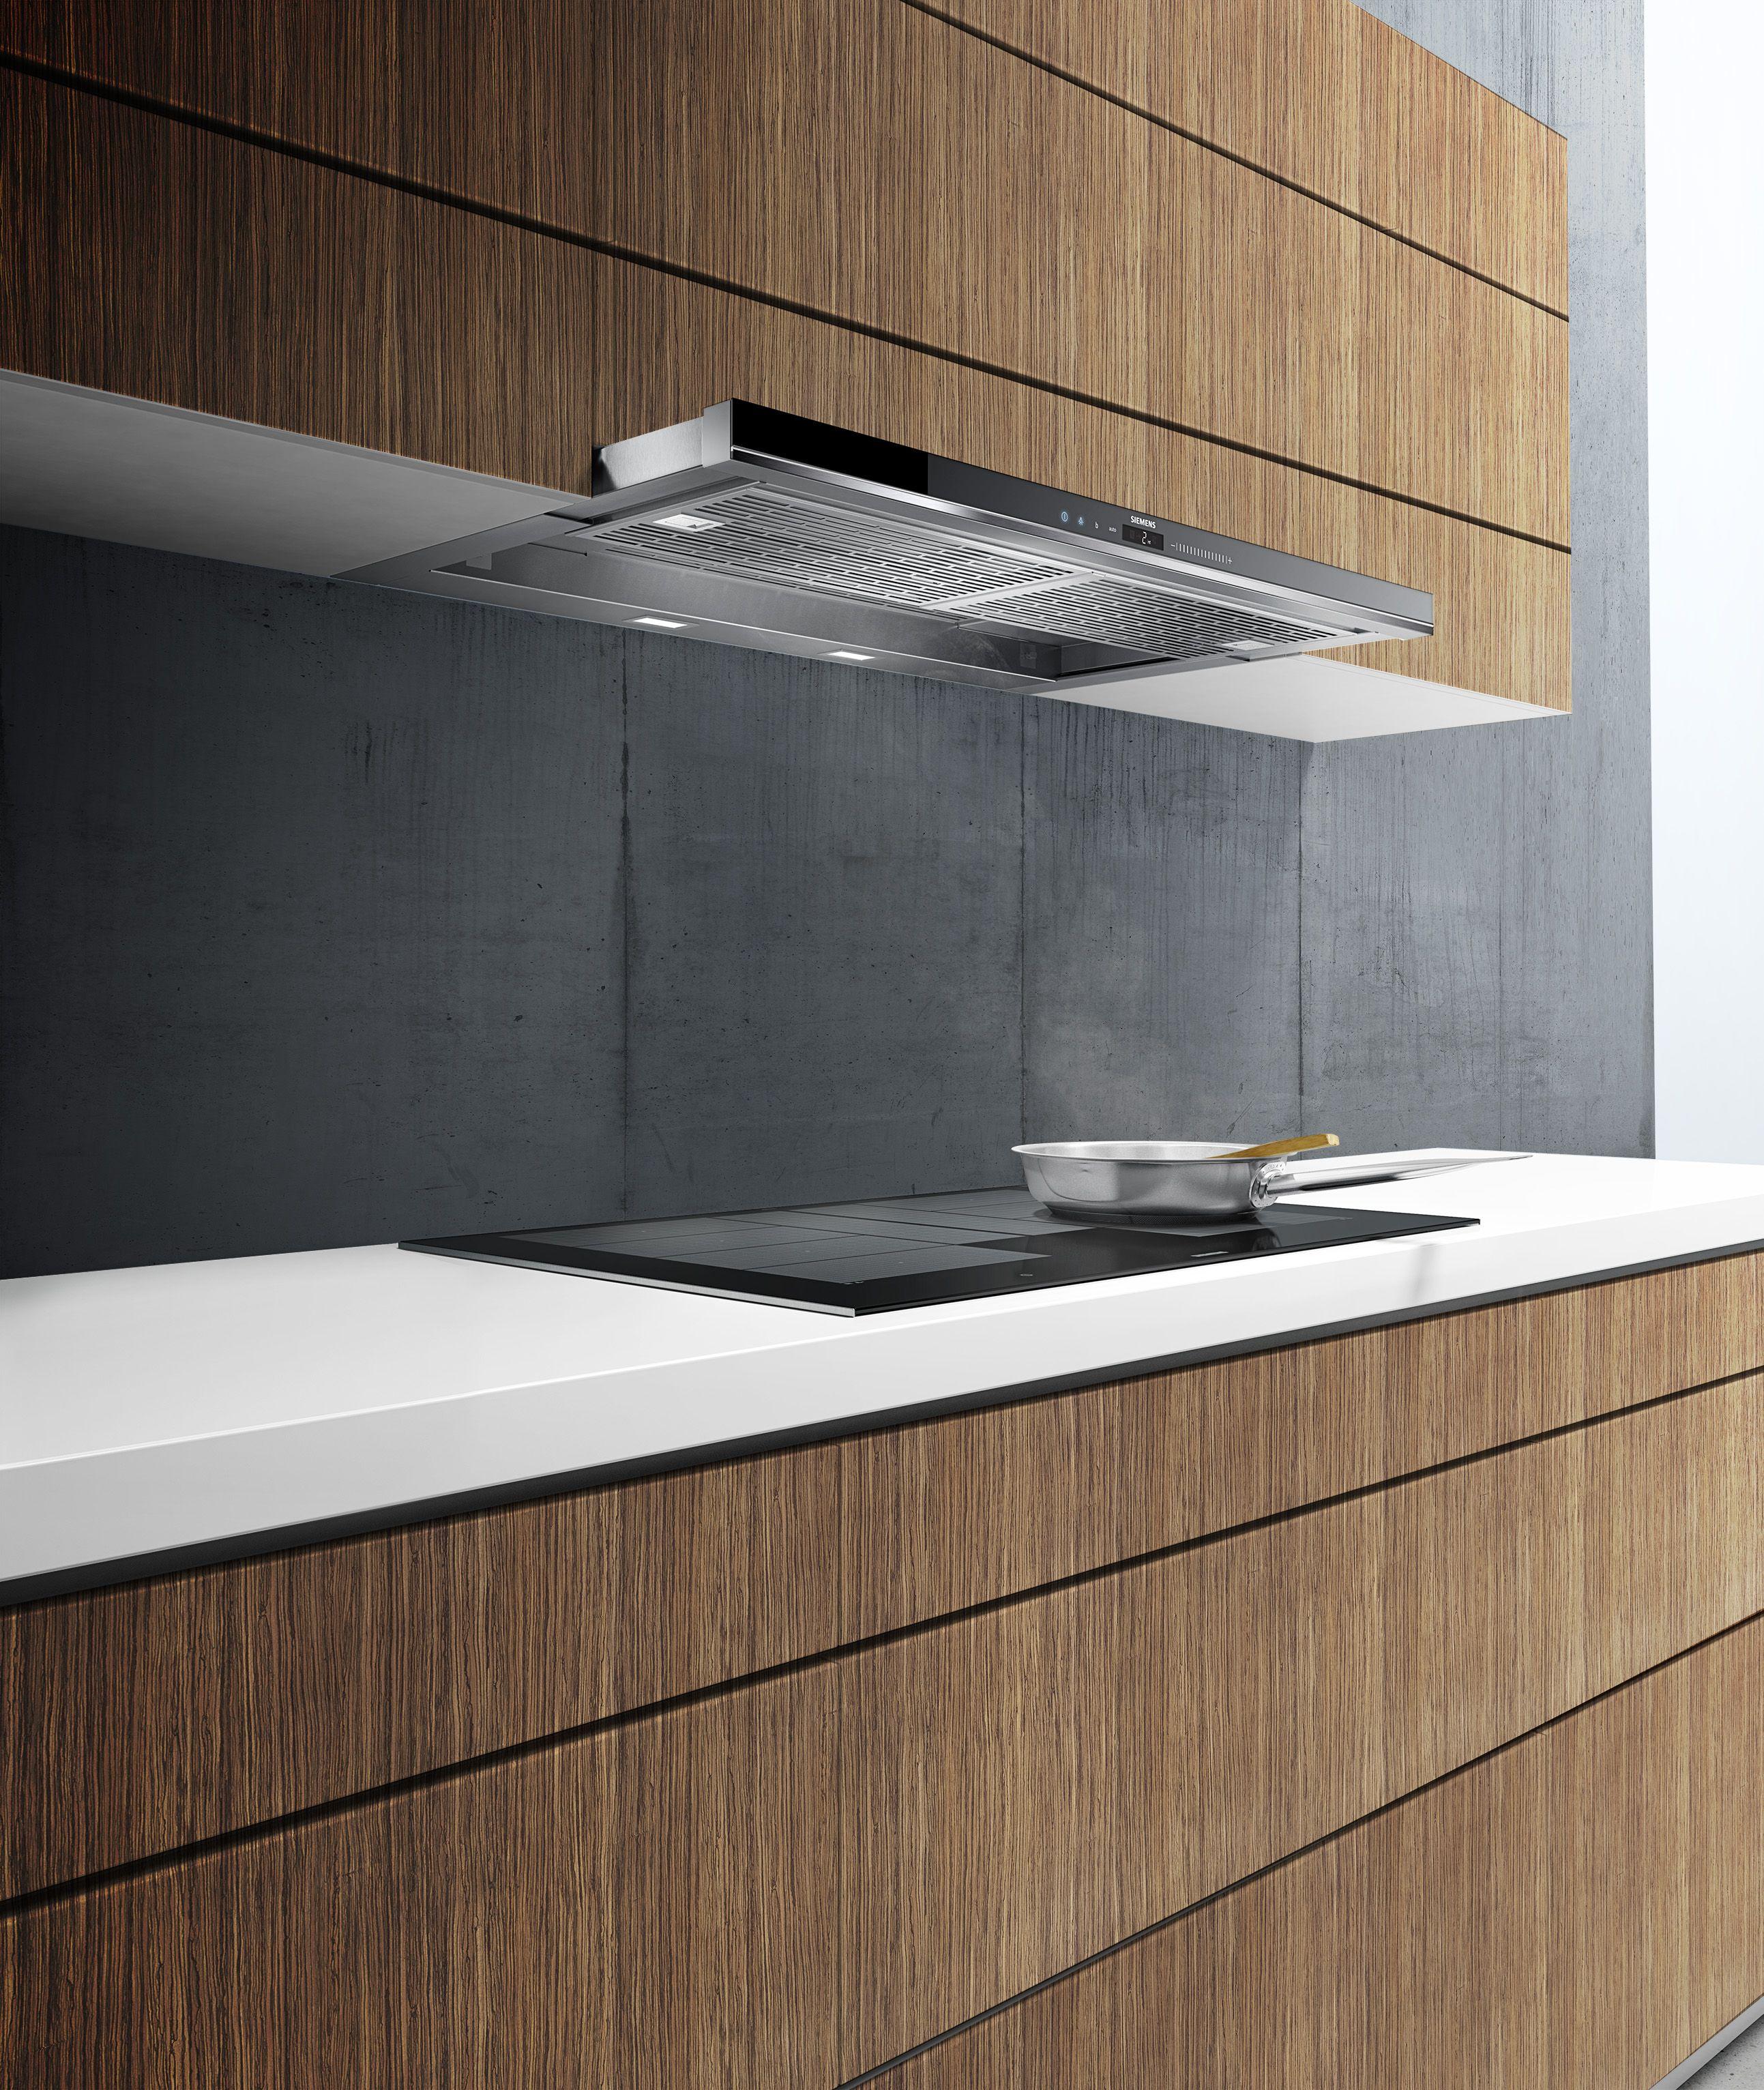 Siemens Hob & Hood Kitchen fittings, Home appliances